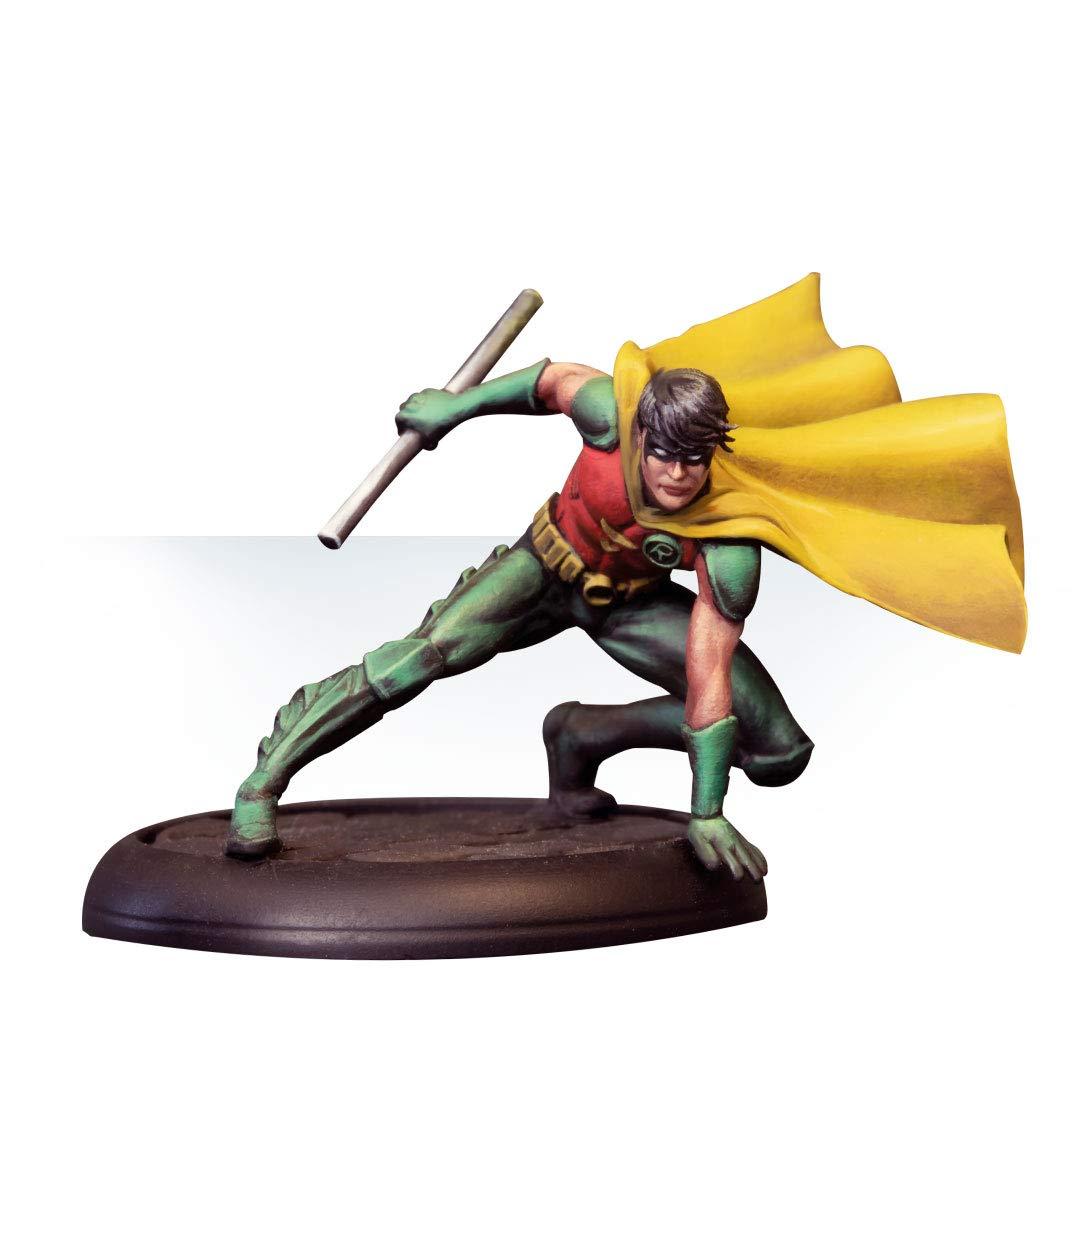 Knight Models Juego de Mesa - Miniaturas Resina DC Comics Superheroe - Batman Robin (Jason Todd): Amazon.es: Juguetes y juegos